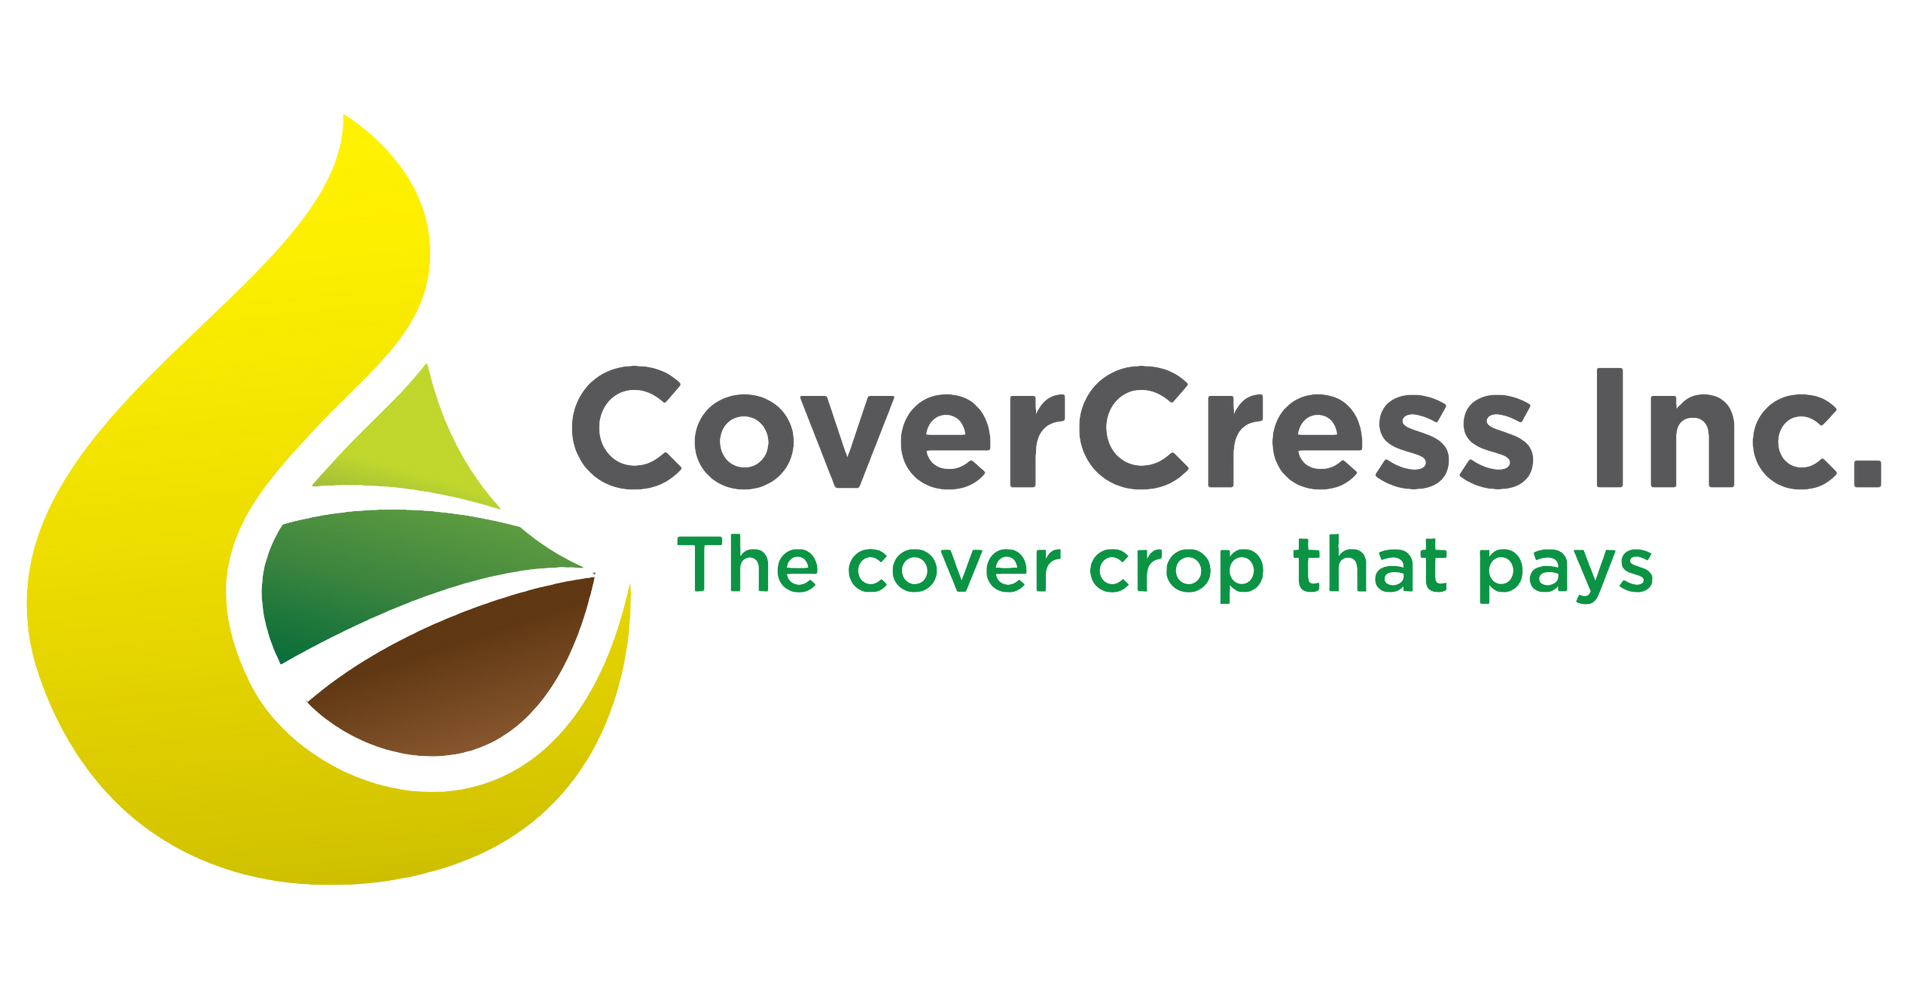 CoverCress